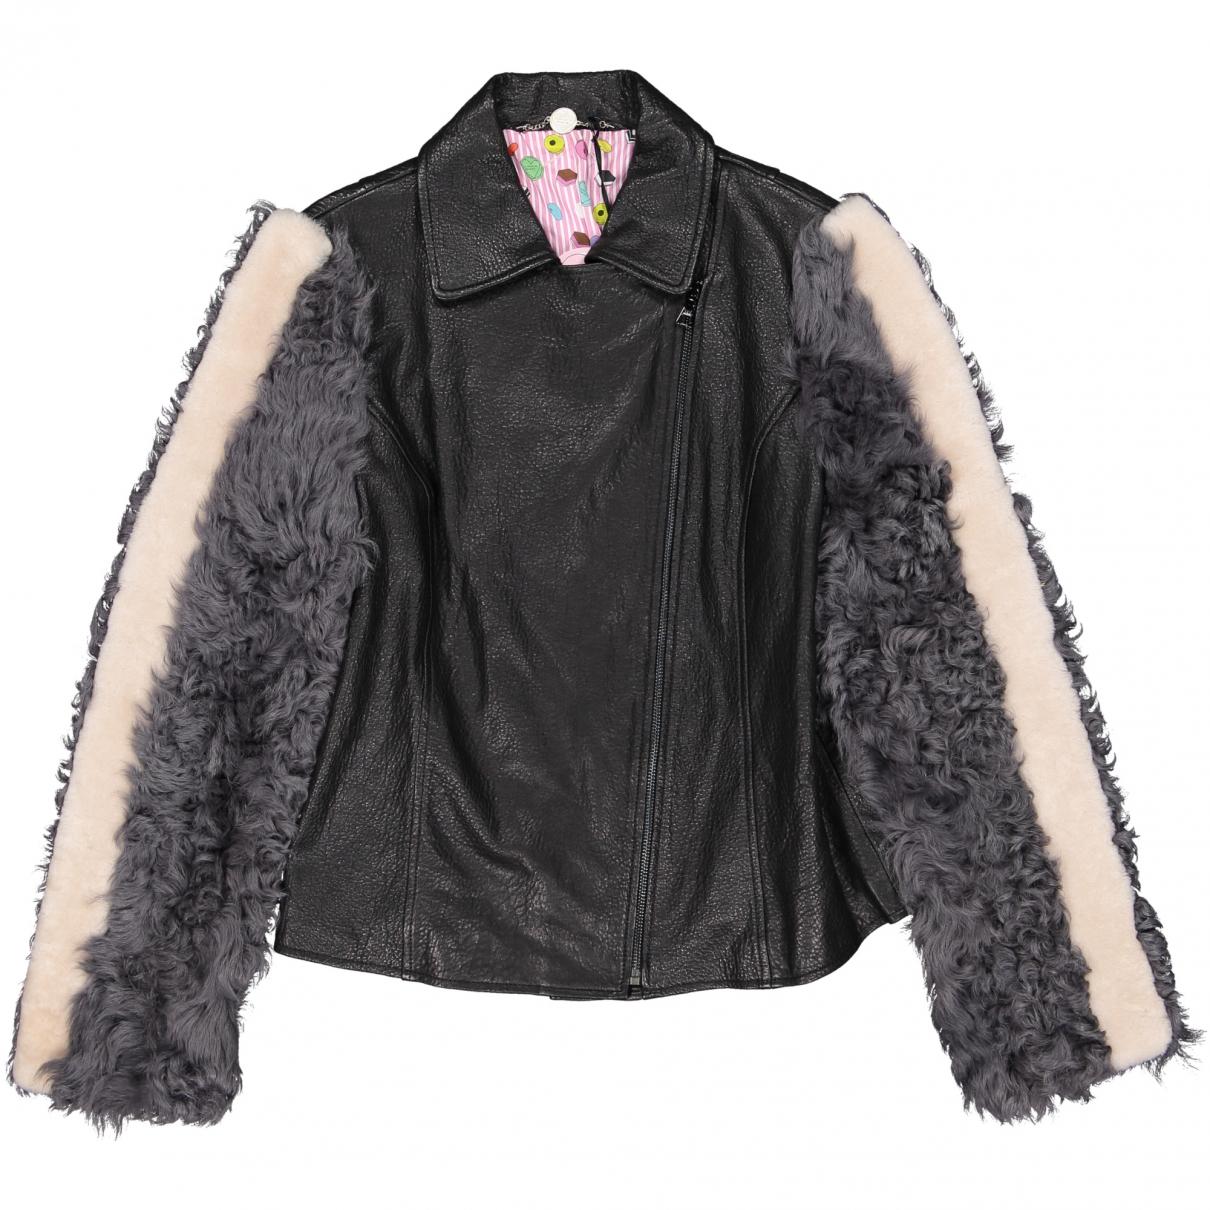 Charlotte Simone \N Black Leather jacket for Women L International